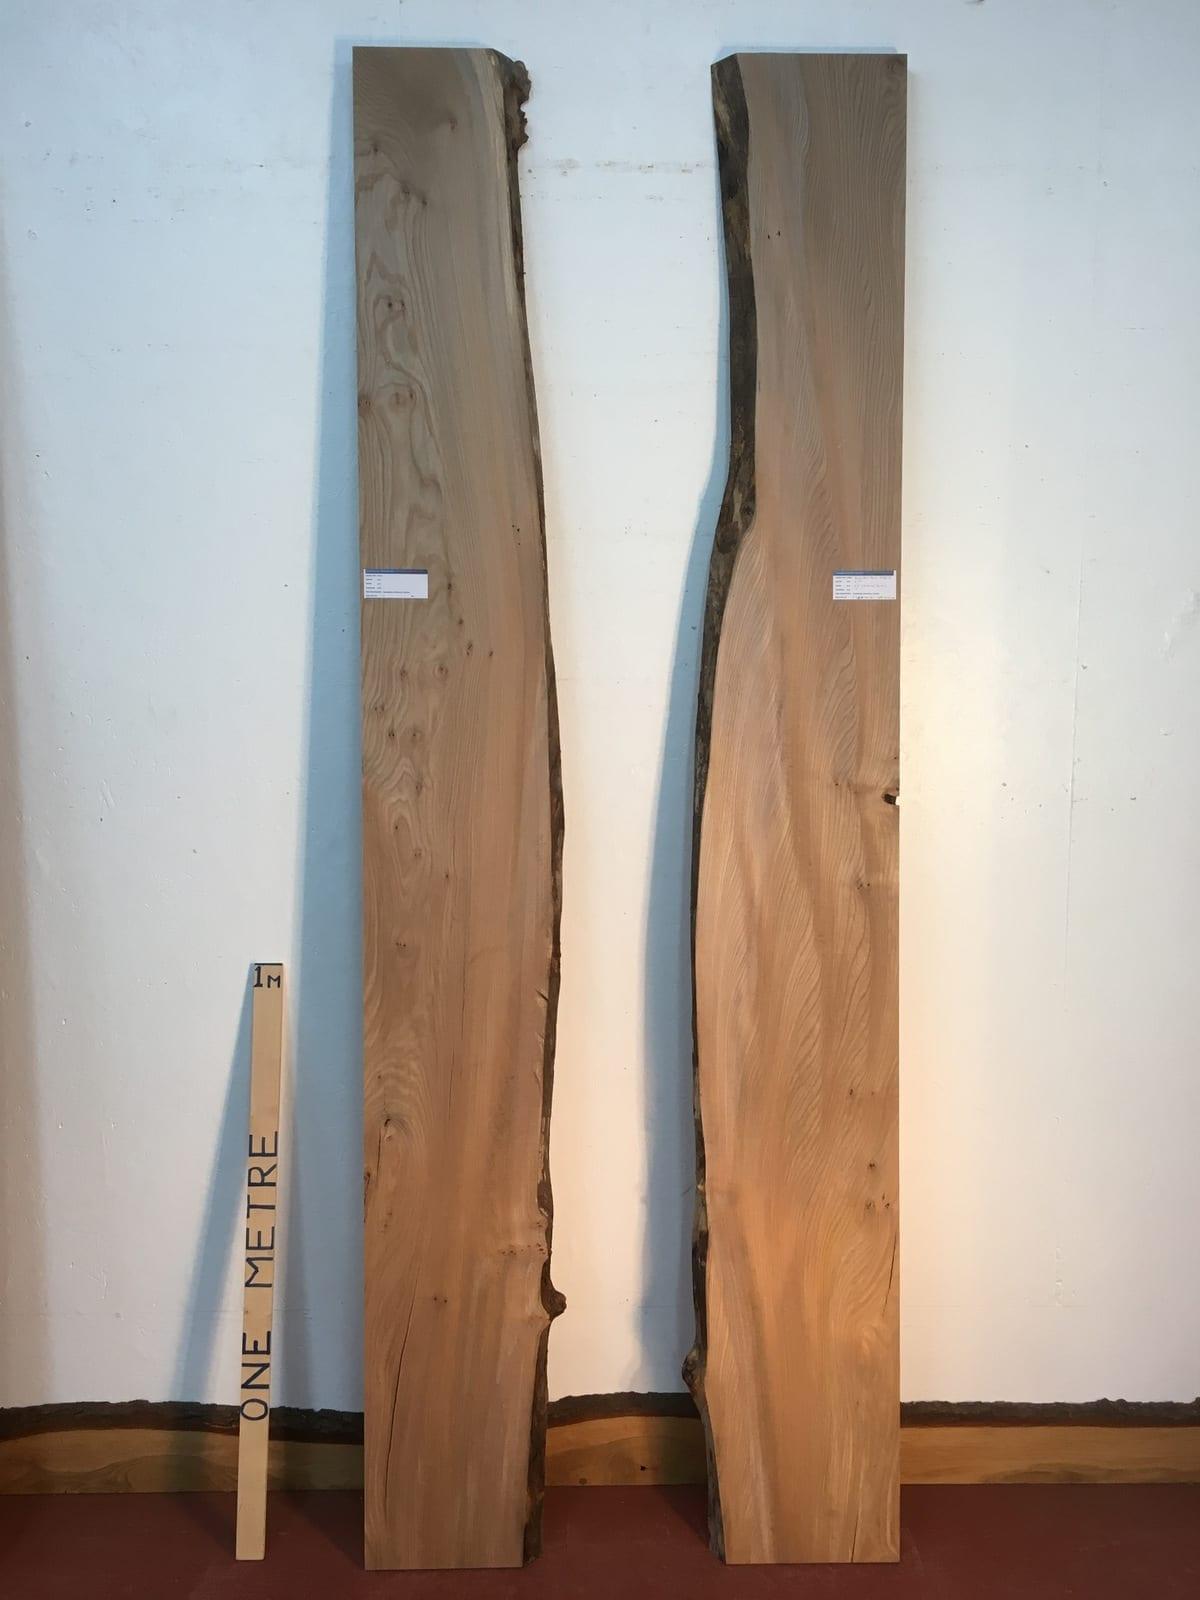 ELM 1476-3 River Set Single Waney Natural Live Edge Slabs Planed Kiln Dried Seasoned Hardwood Board Thickness 4cm Wildwood River Tables